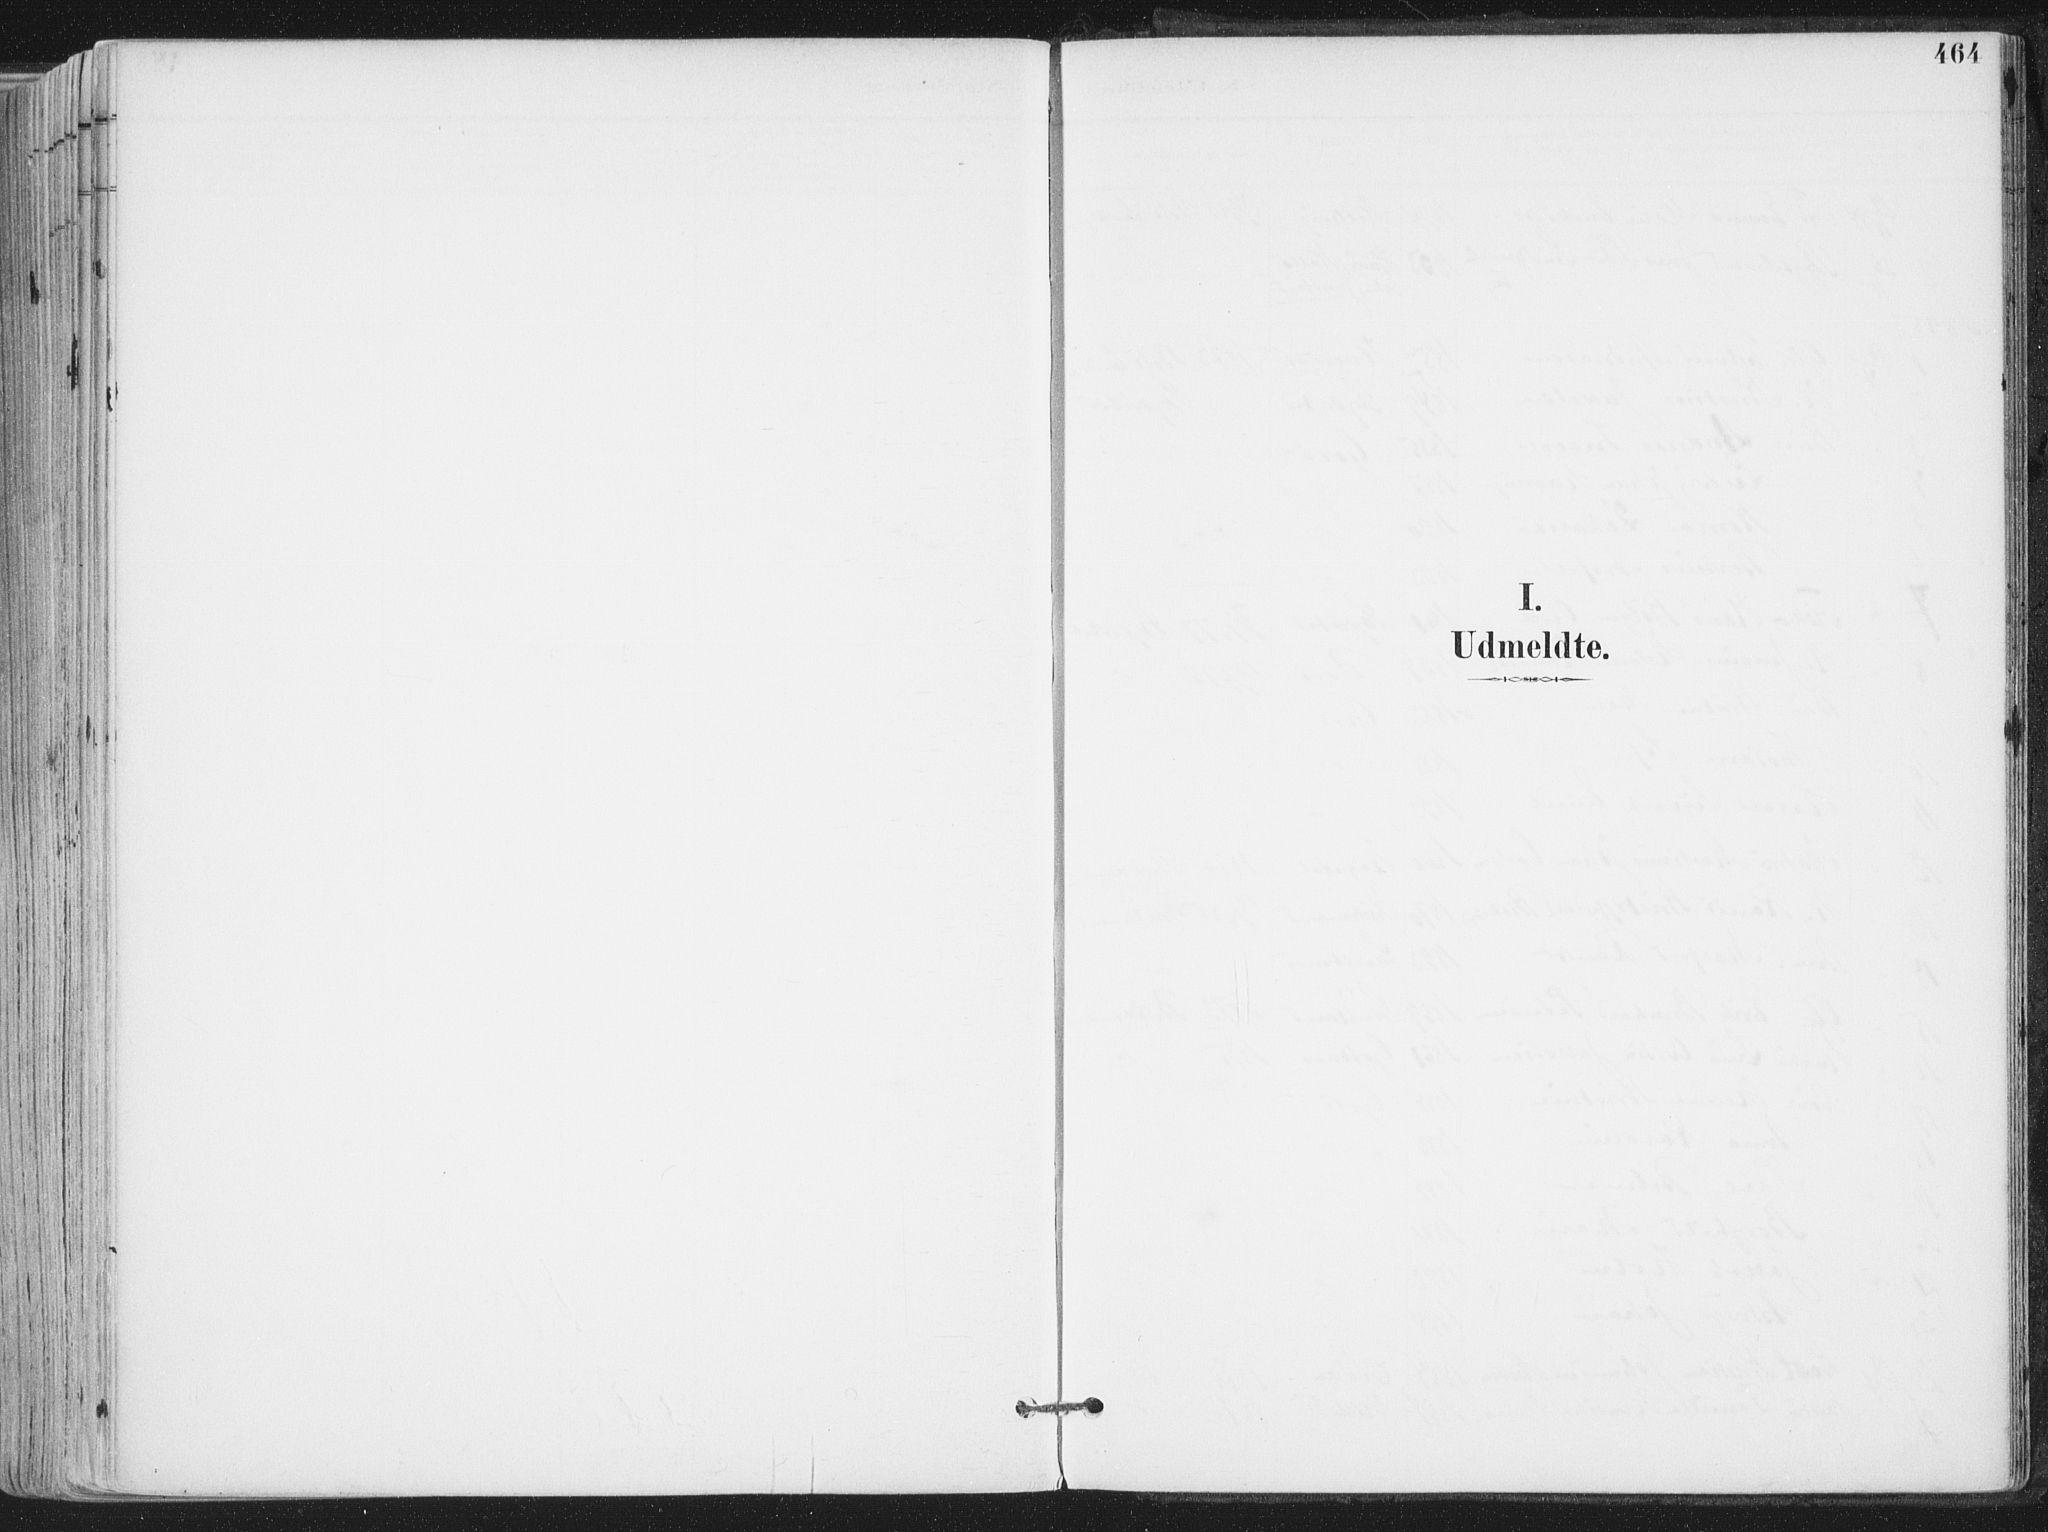 SAT, Ministerialprotokoller, klokkerbøker og fødselsregistre - Nordland, 802/L0055: Ministerialbok nr. 802A02, 1894-1915, s. 464